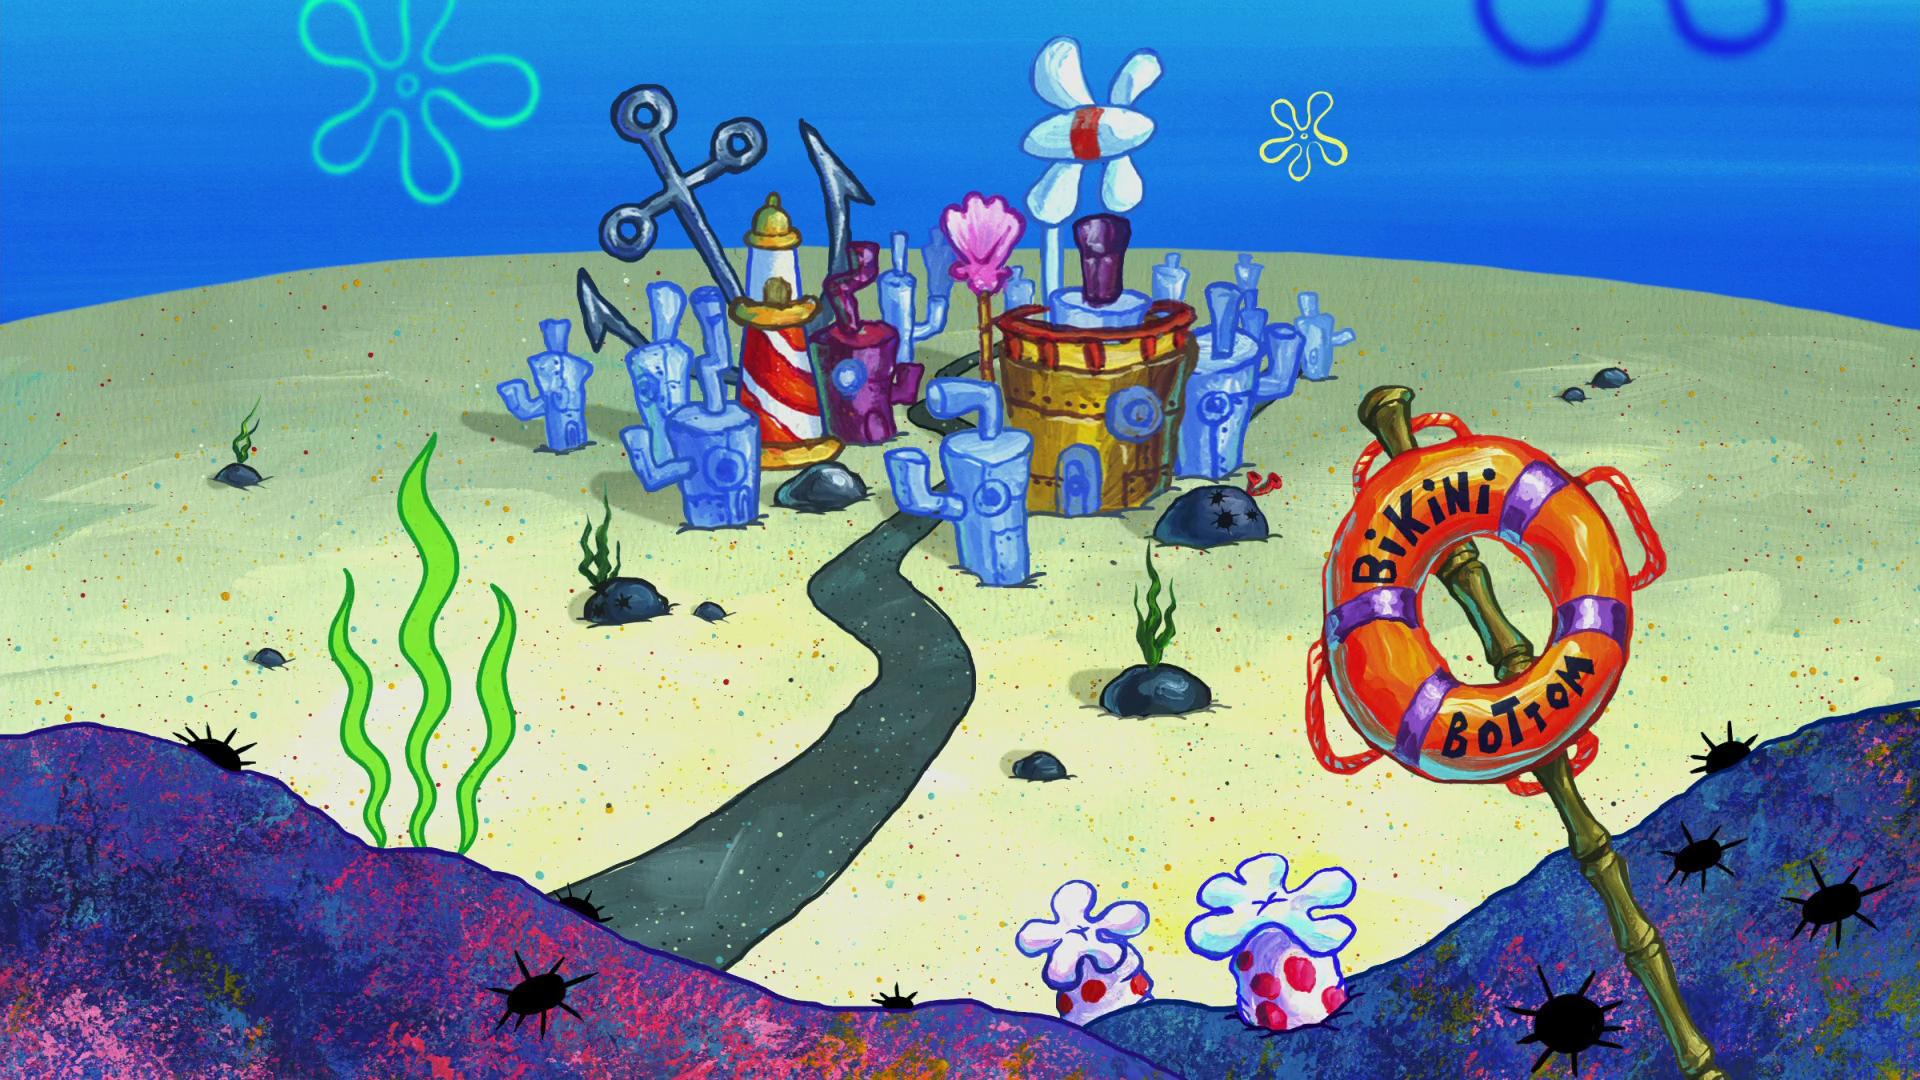 Spongebob Squarepants Bikini Bottom